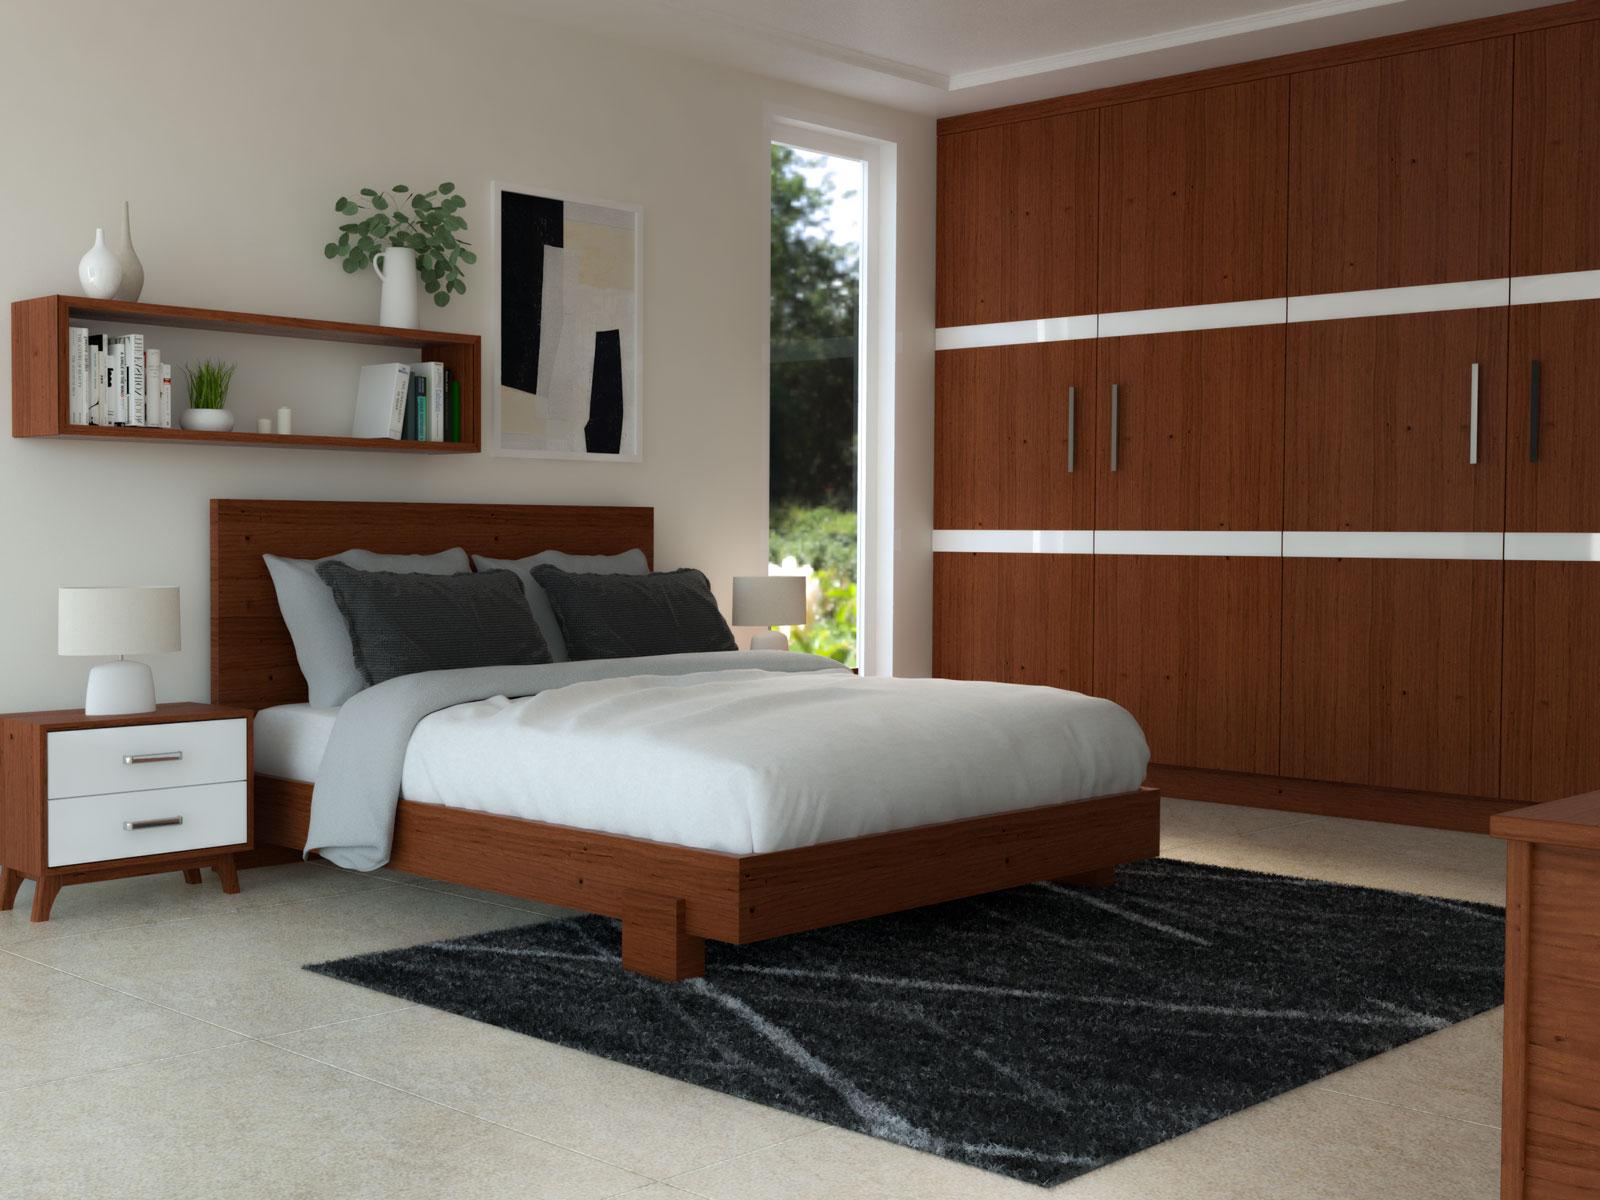 Black rug with cherry furnishings